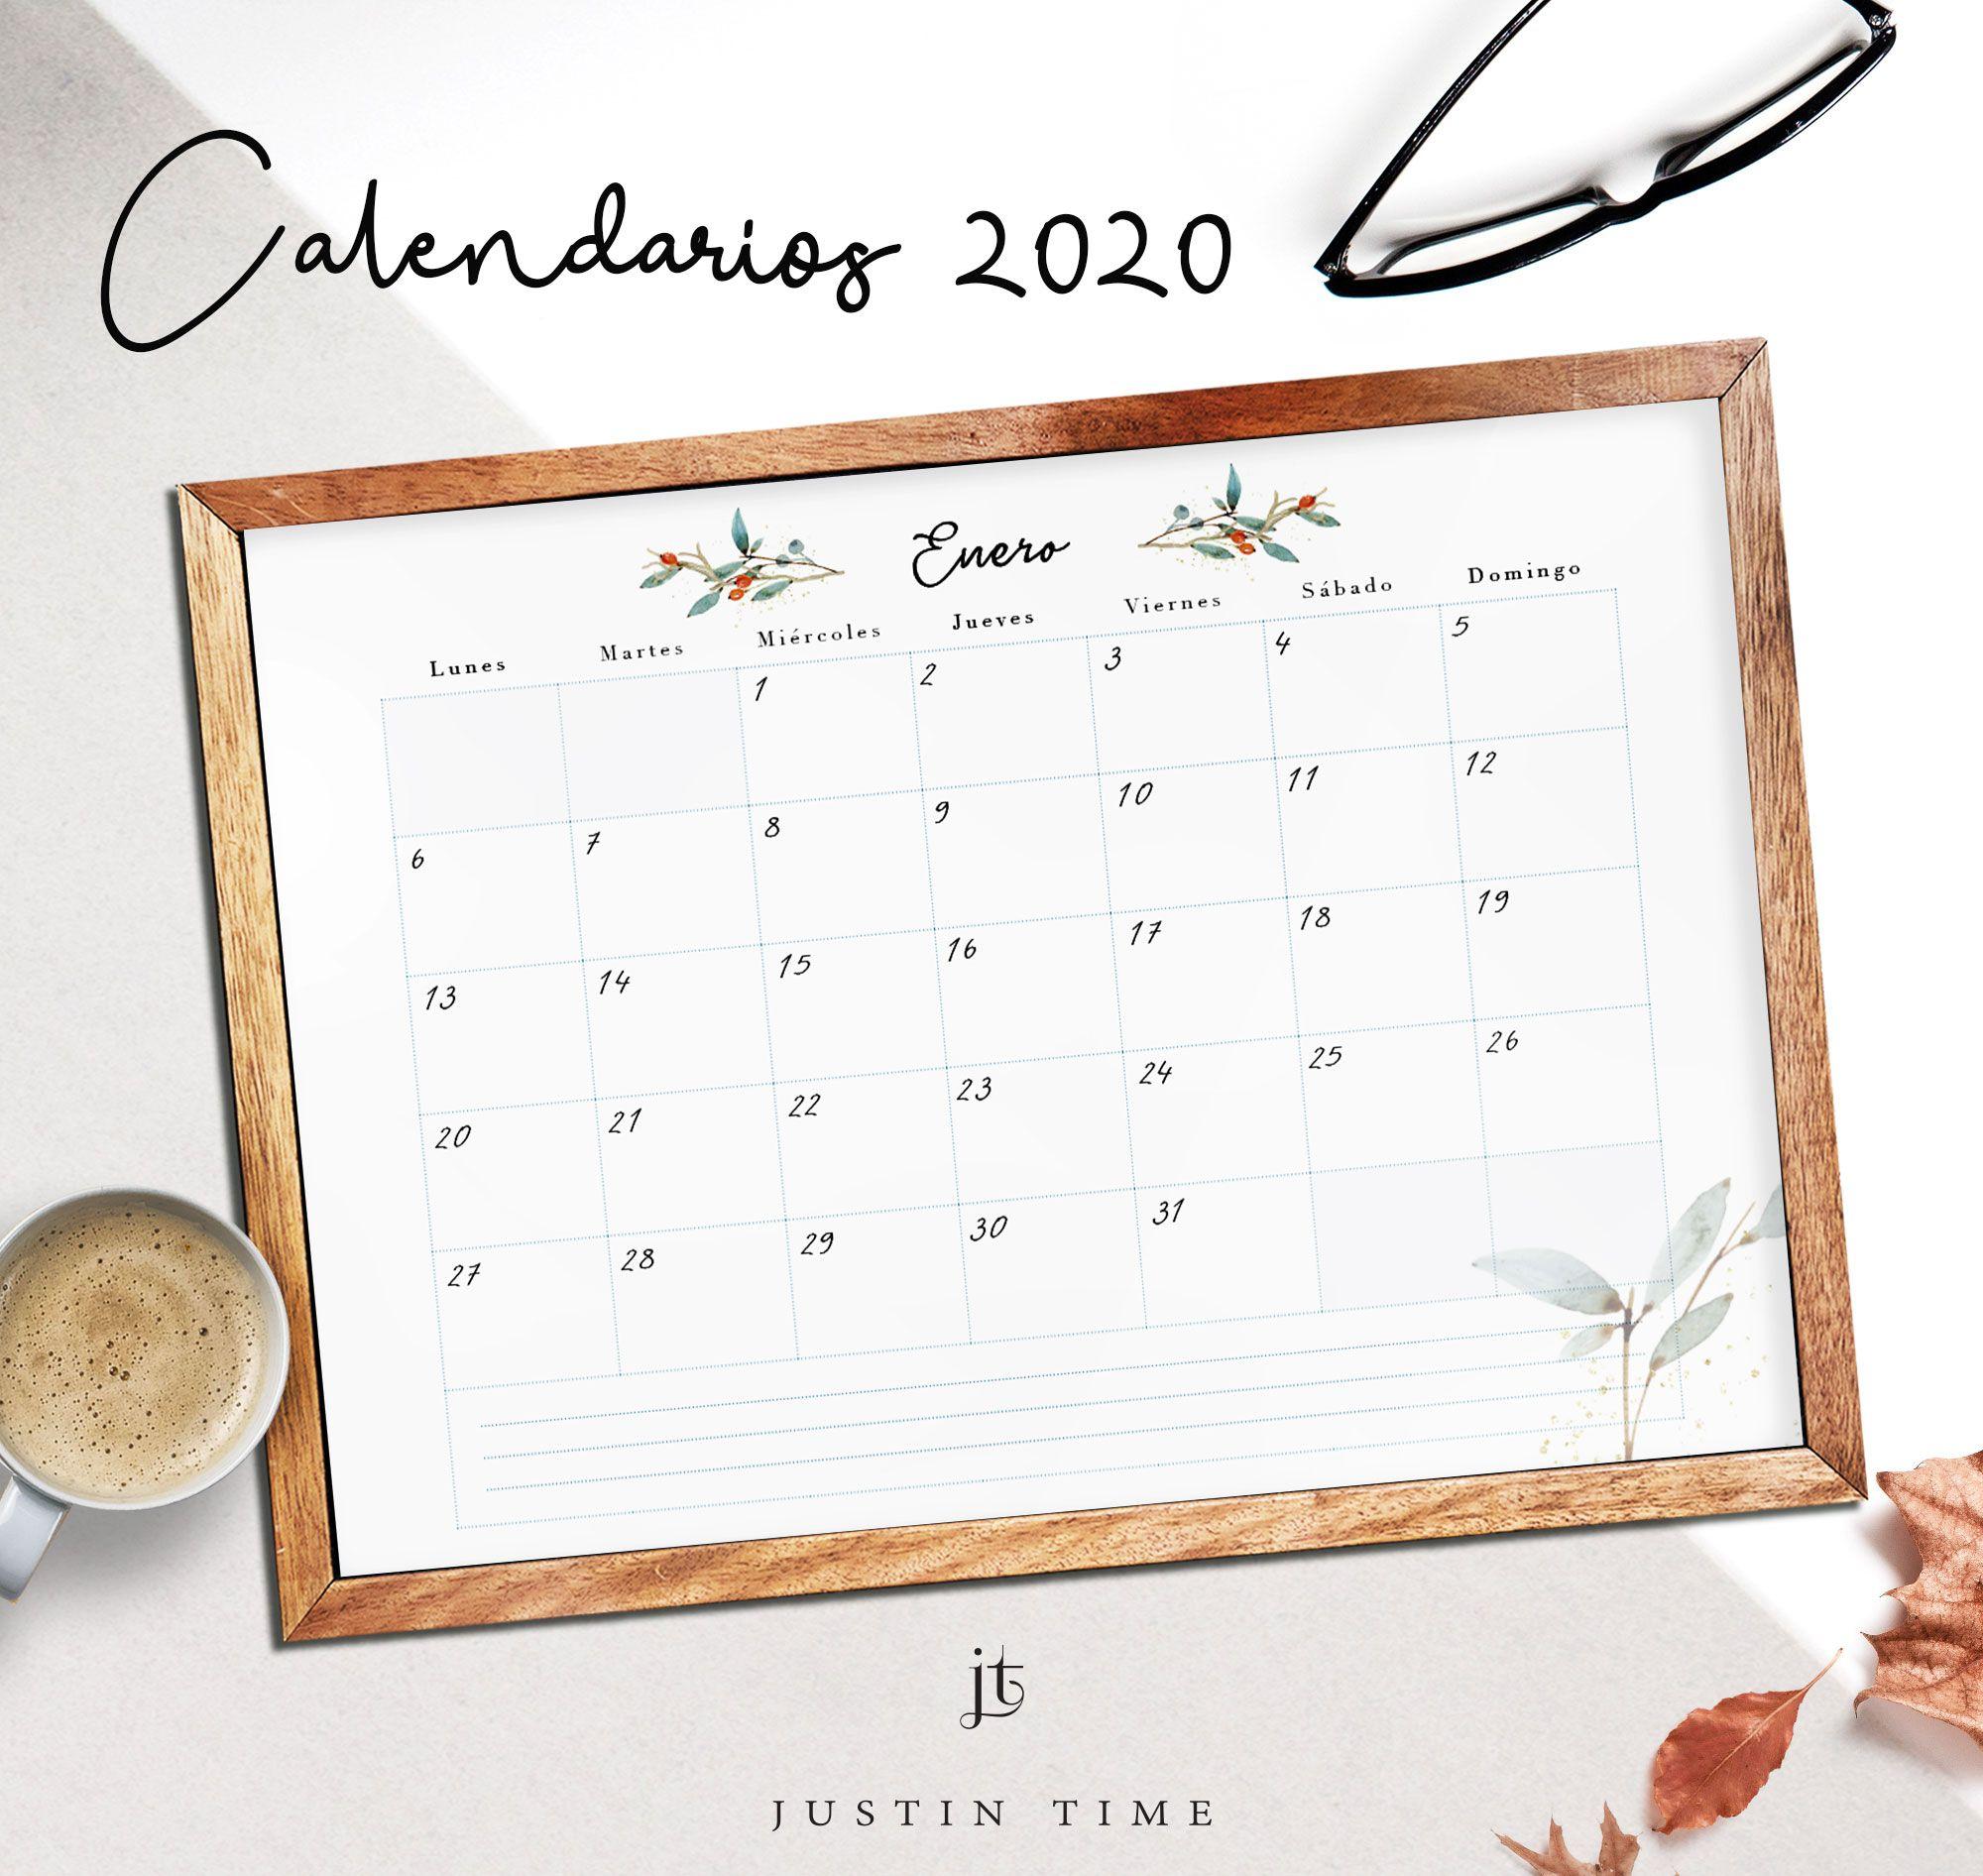 Hojas De Calendario Para Imprimir A3 A4 A5 Calendario Para Imprimir Calendario Calendario Imprimible